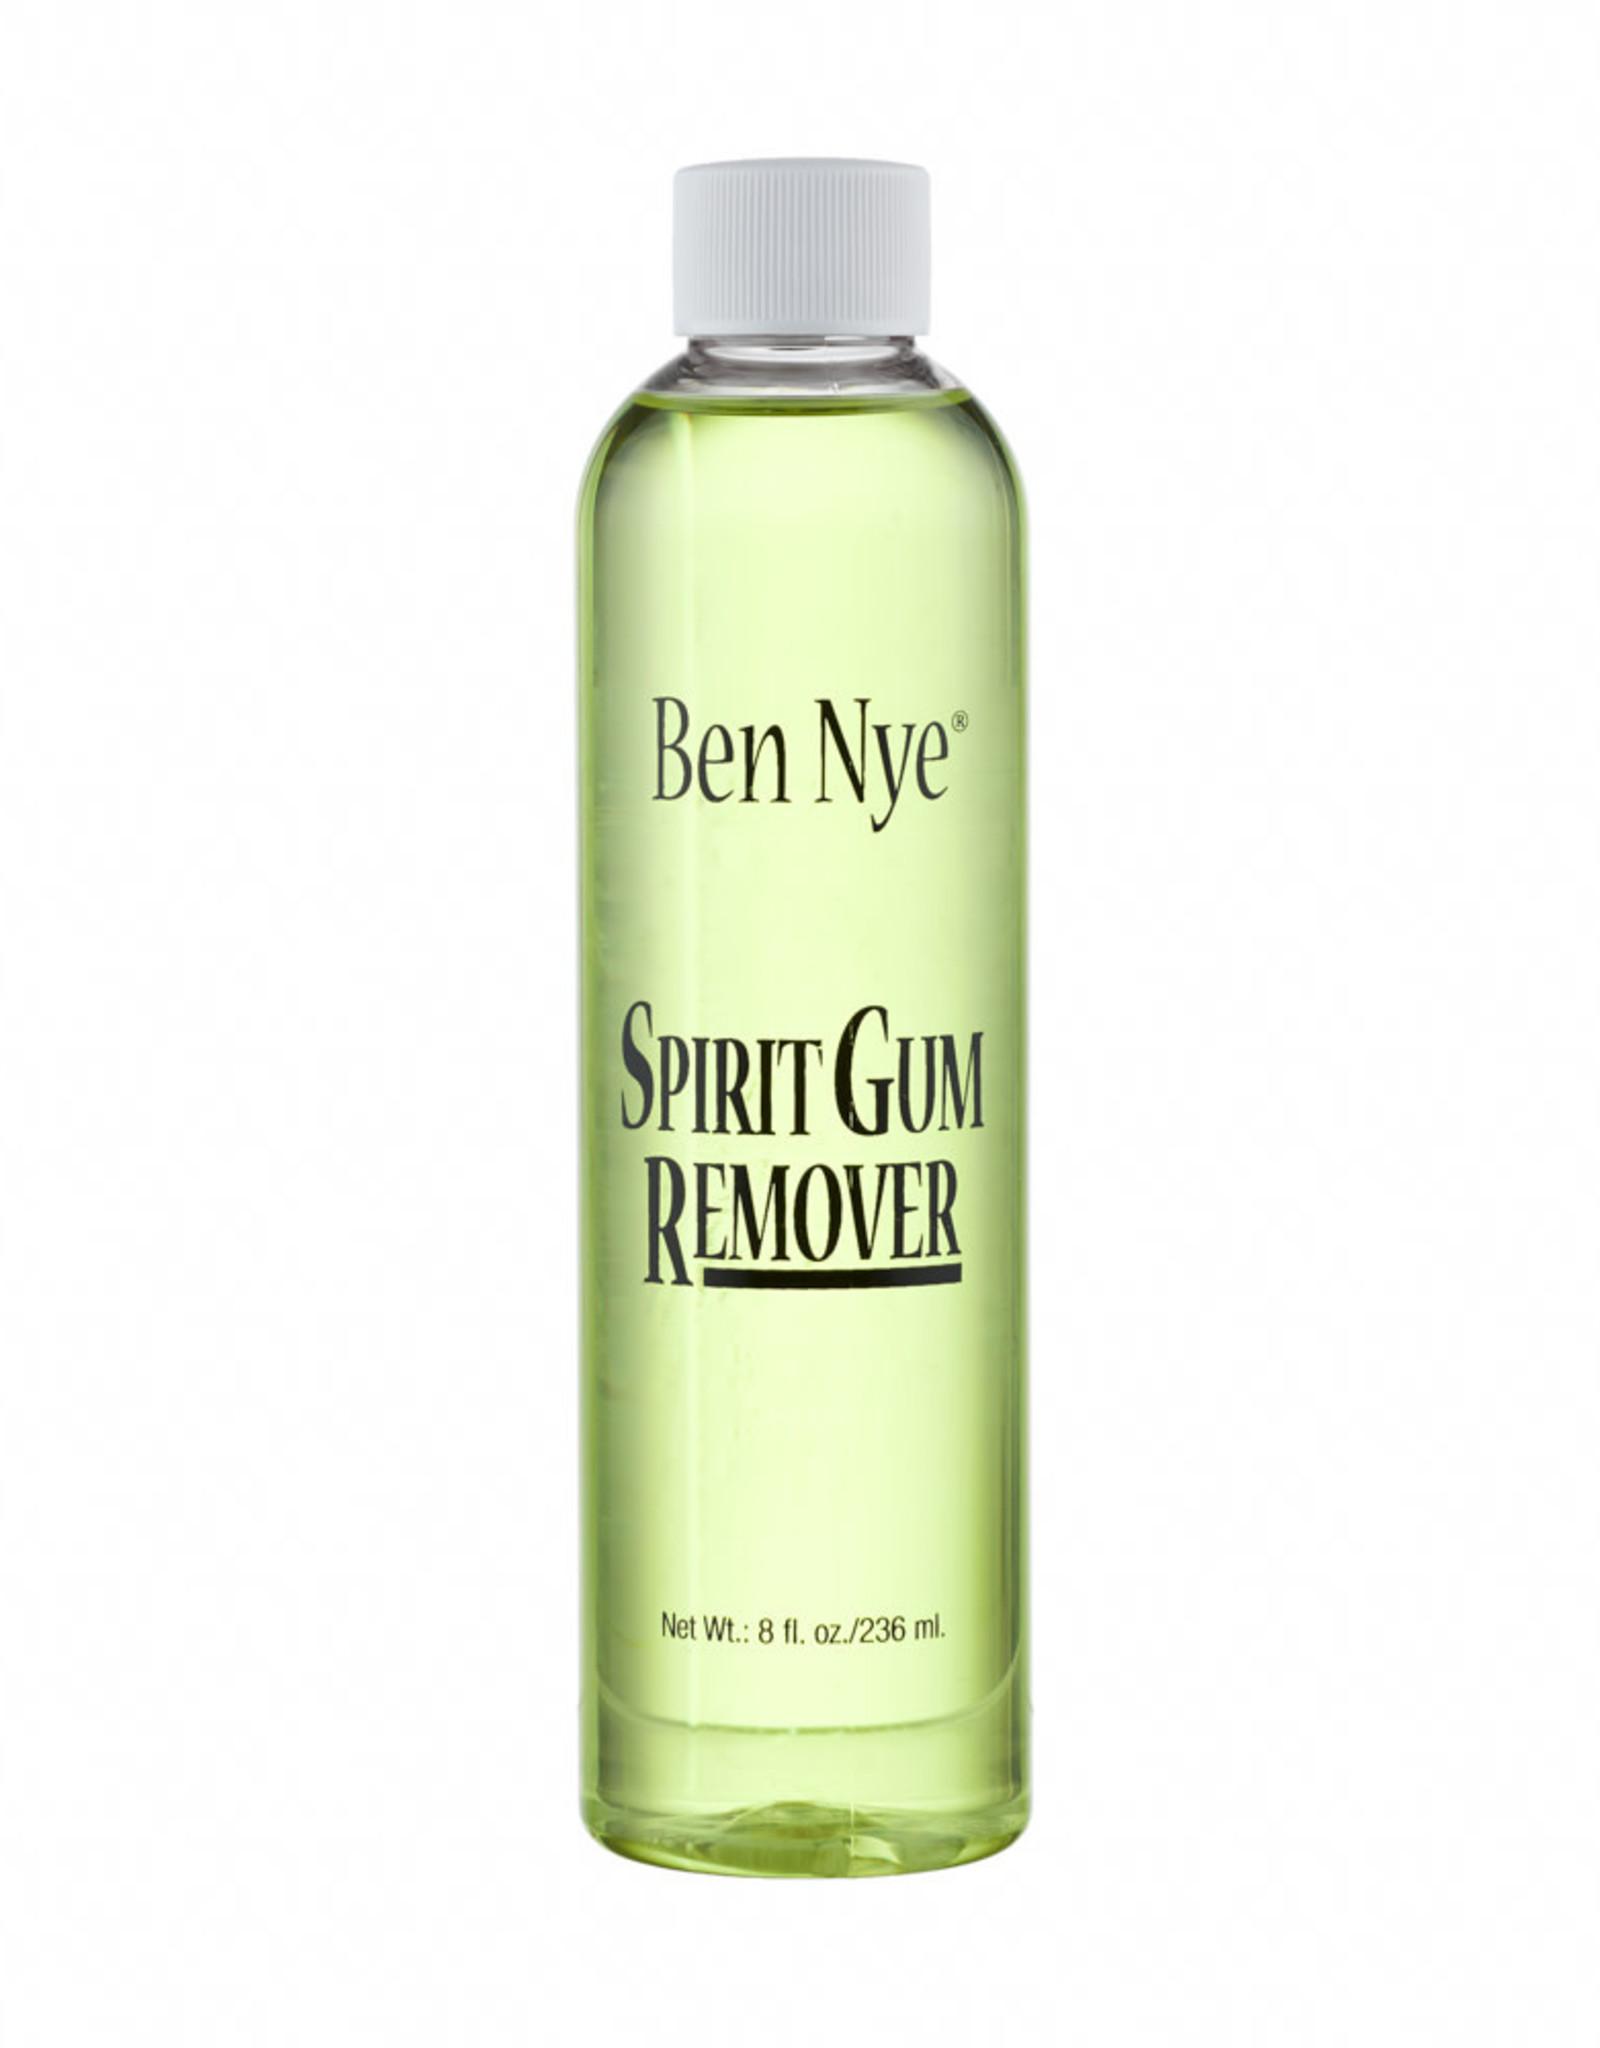 Ben Nye FX SPIRIT GUM REMOVER, 8 FL OZ